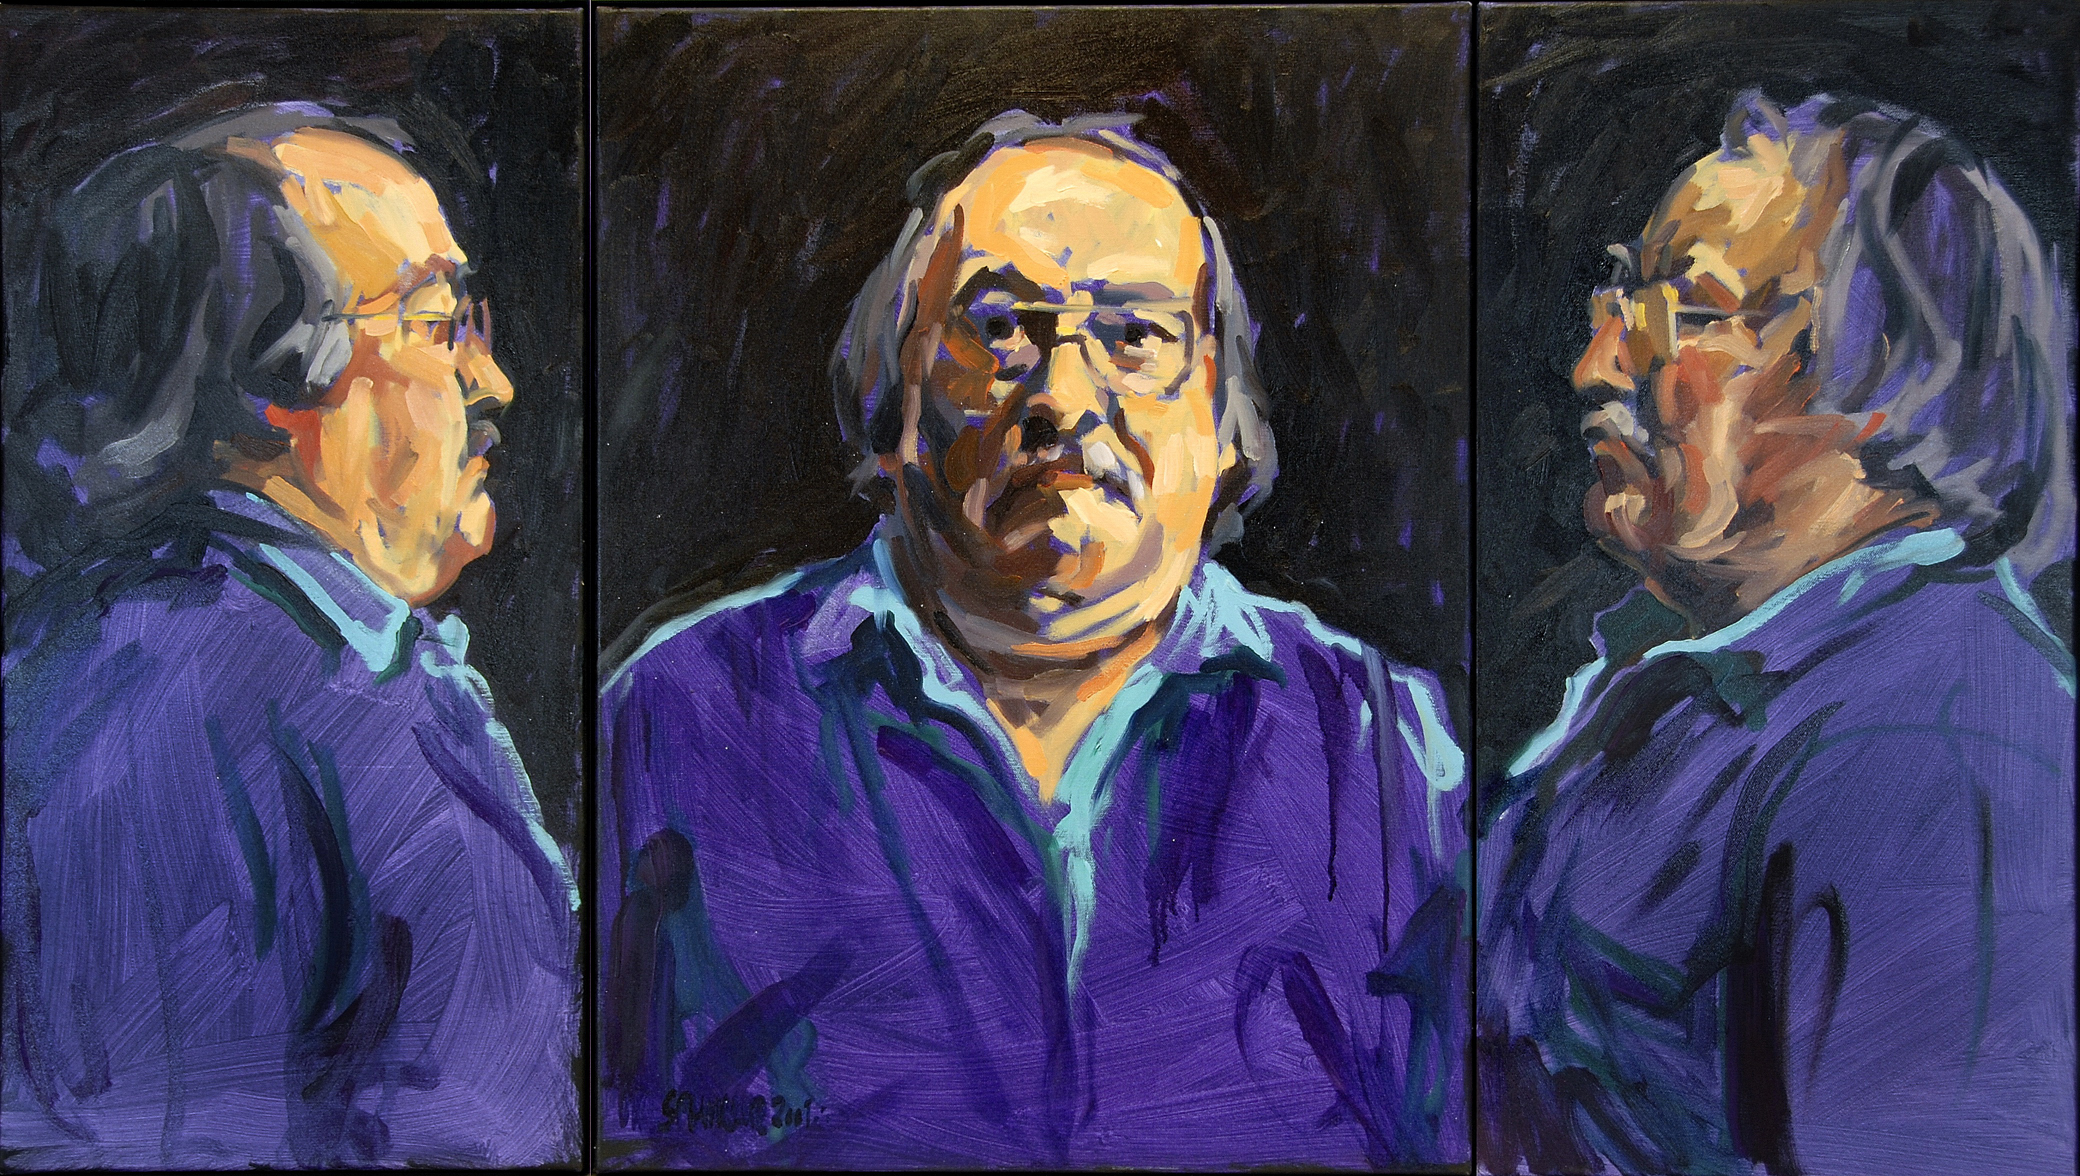 1999,_Selbst,_Triptychon,_Öl_auf_Leinwand,_180_·_100_cm